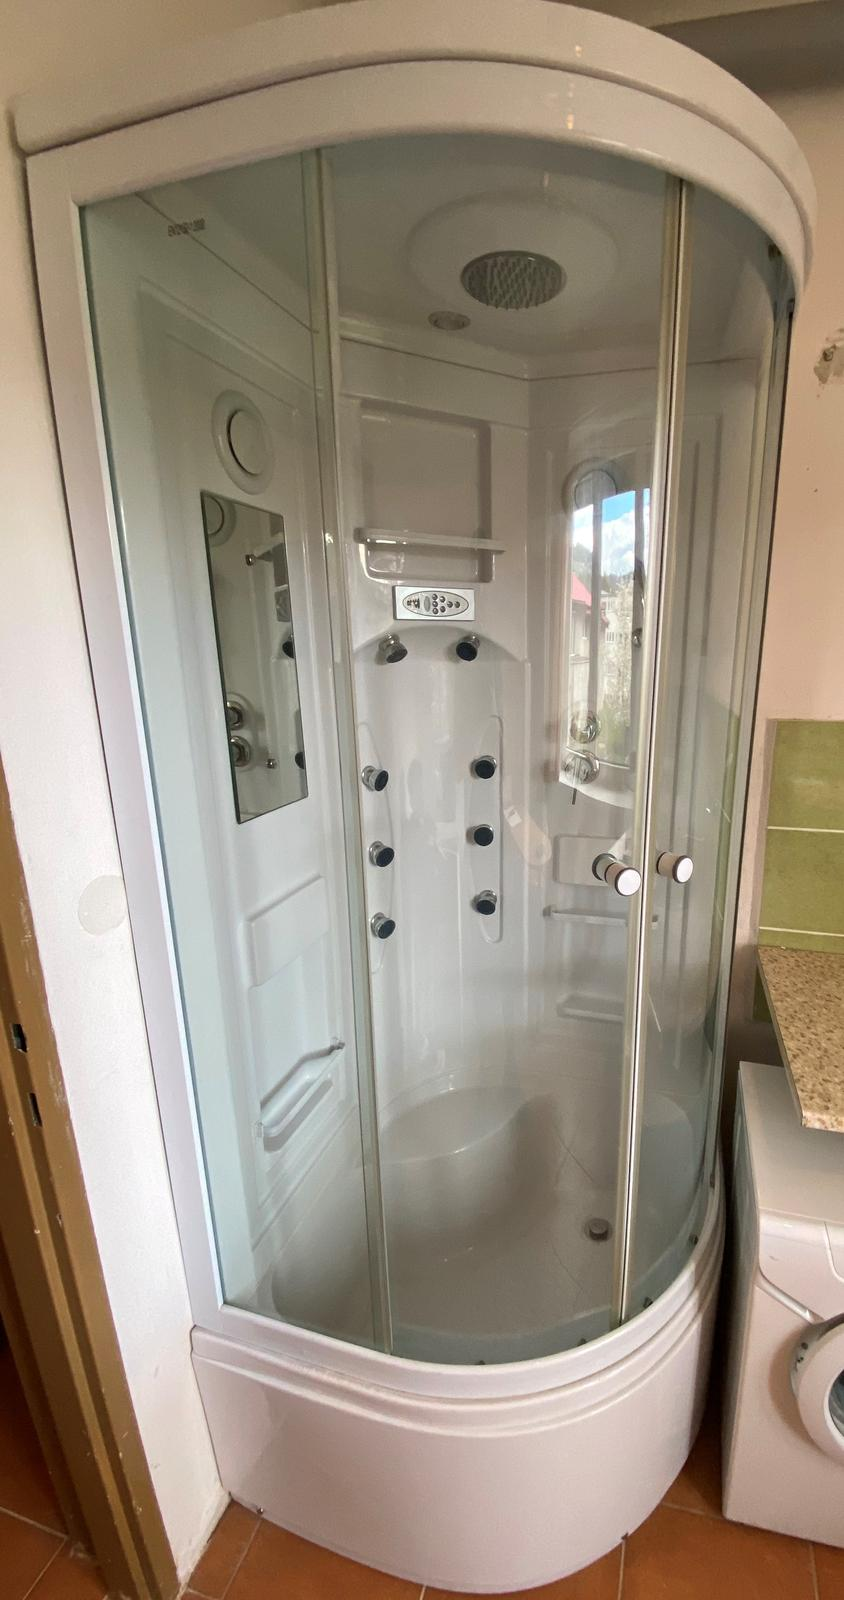 Hydromasážny sprchový kút - Obrázok č. 2